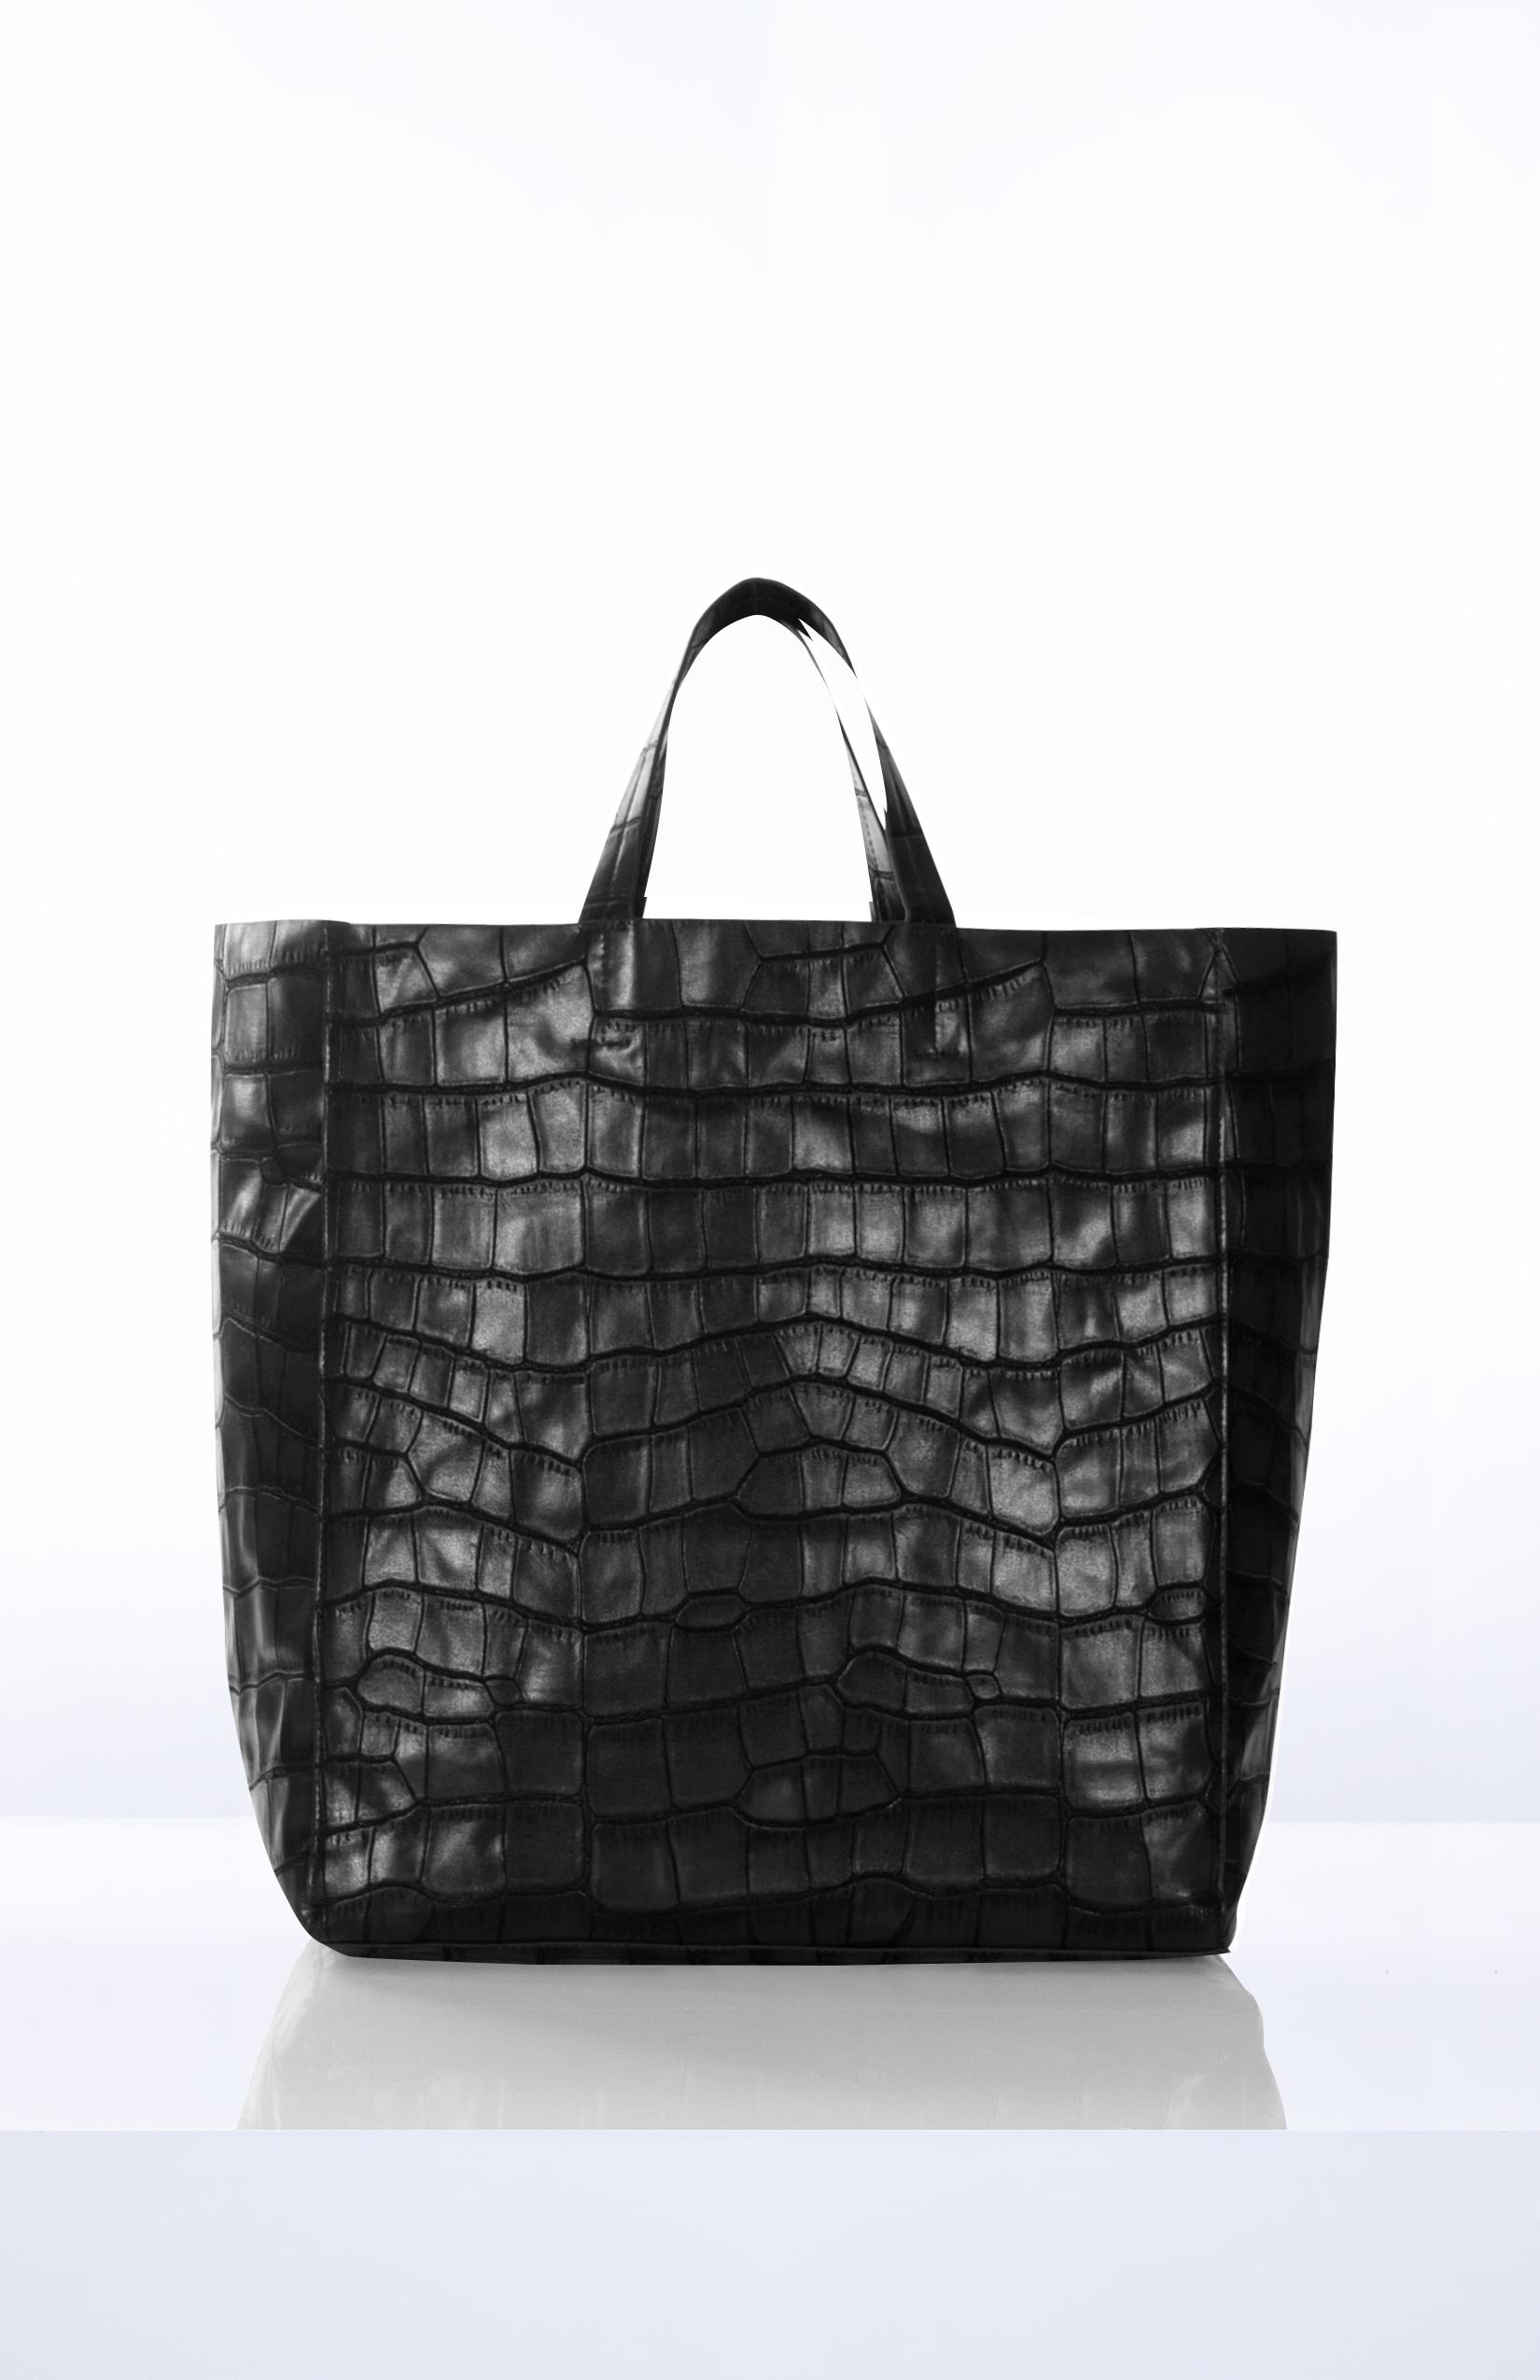 ROONEY- Black Large Format Croc